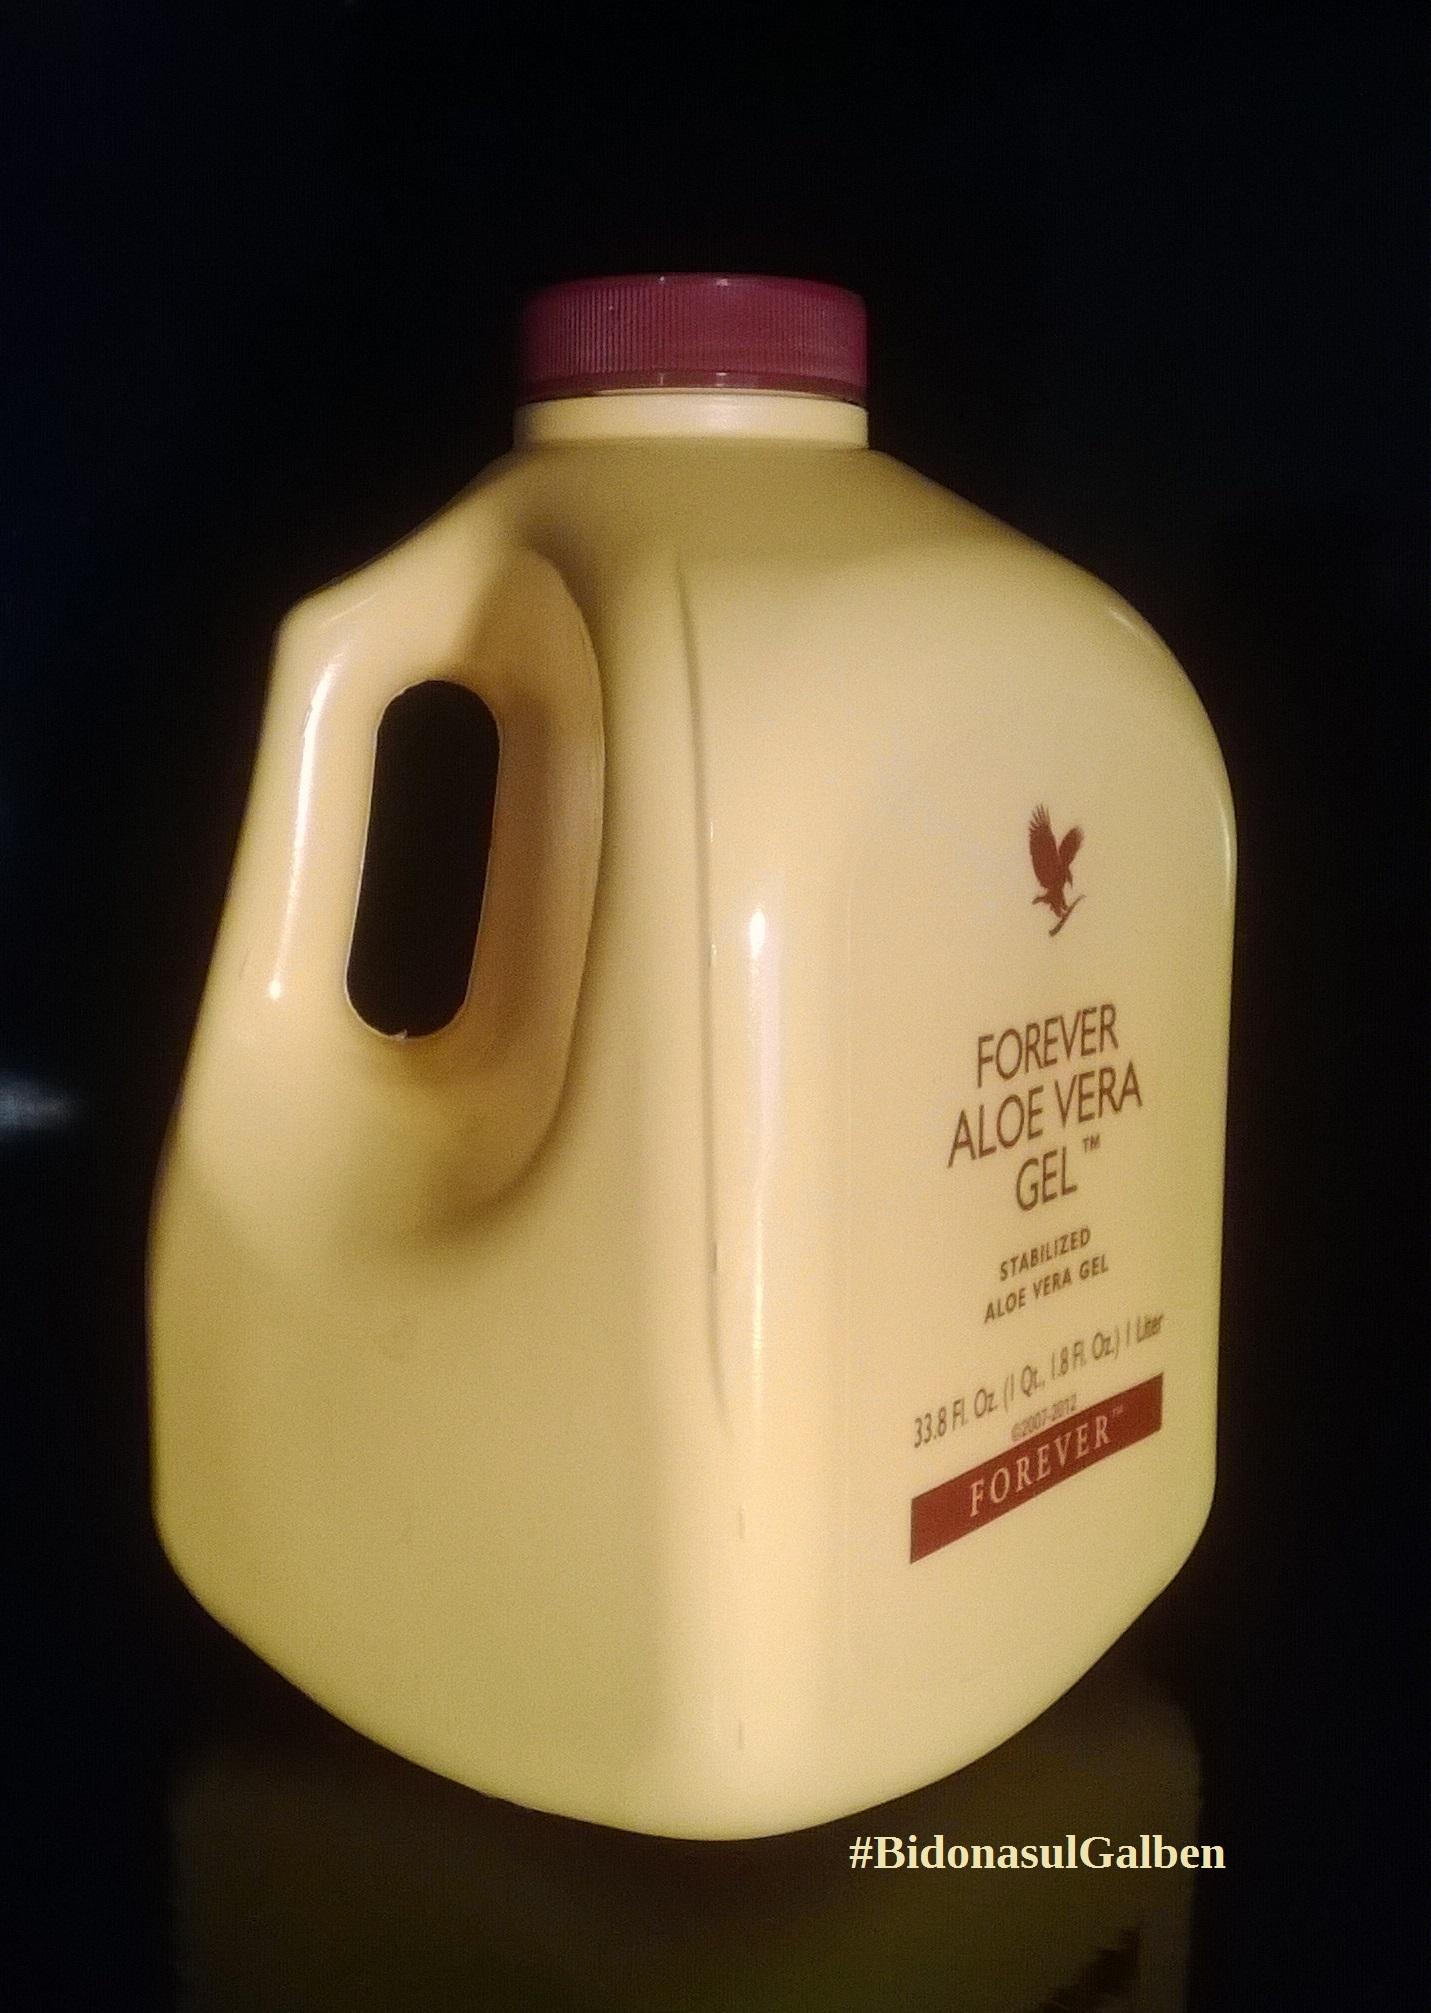 forever-aloe-vera-gel-pret